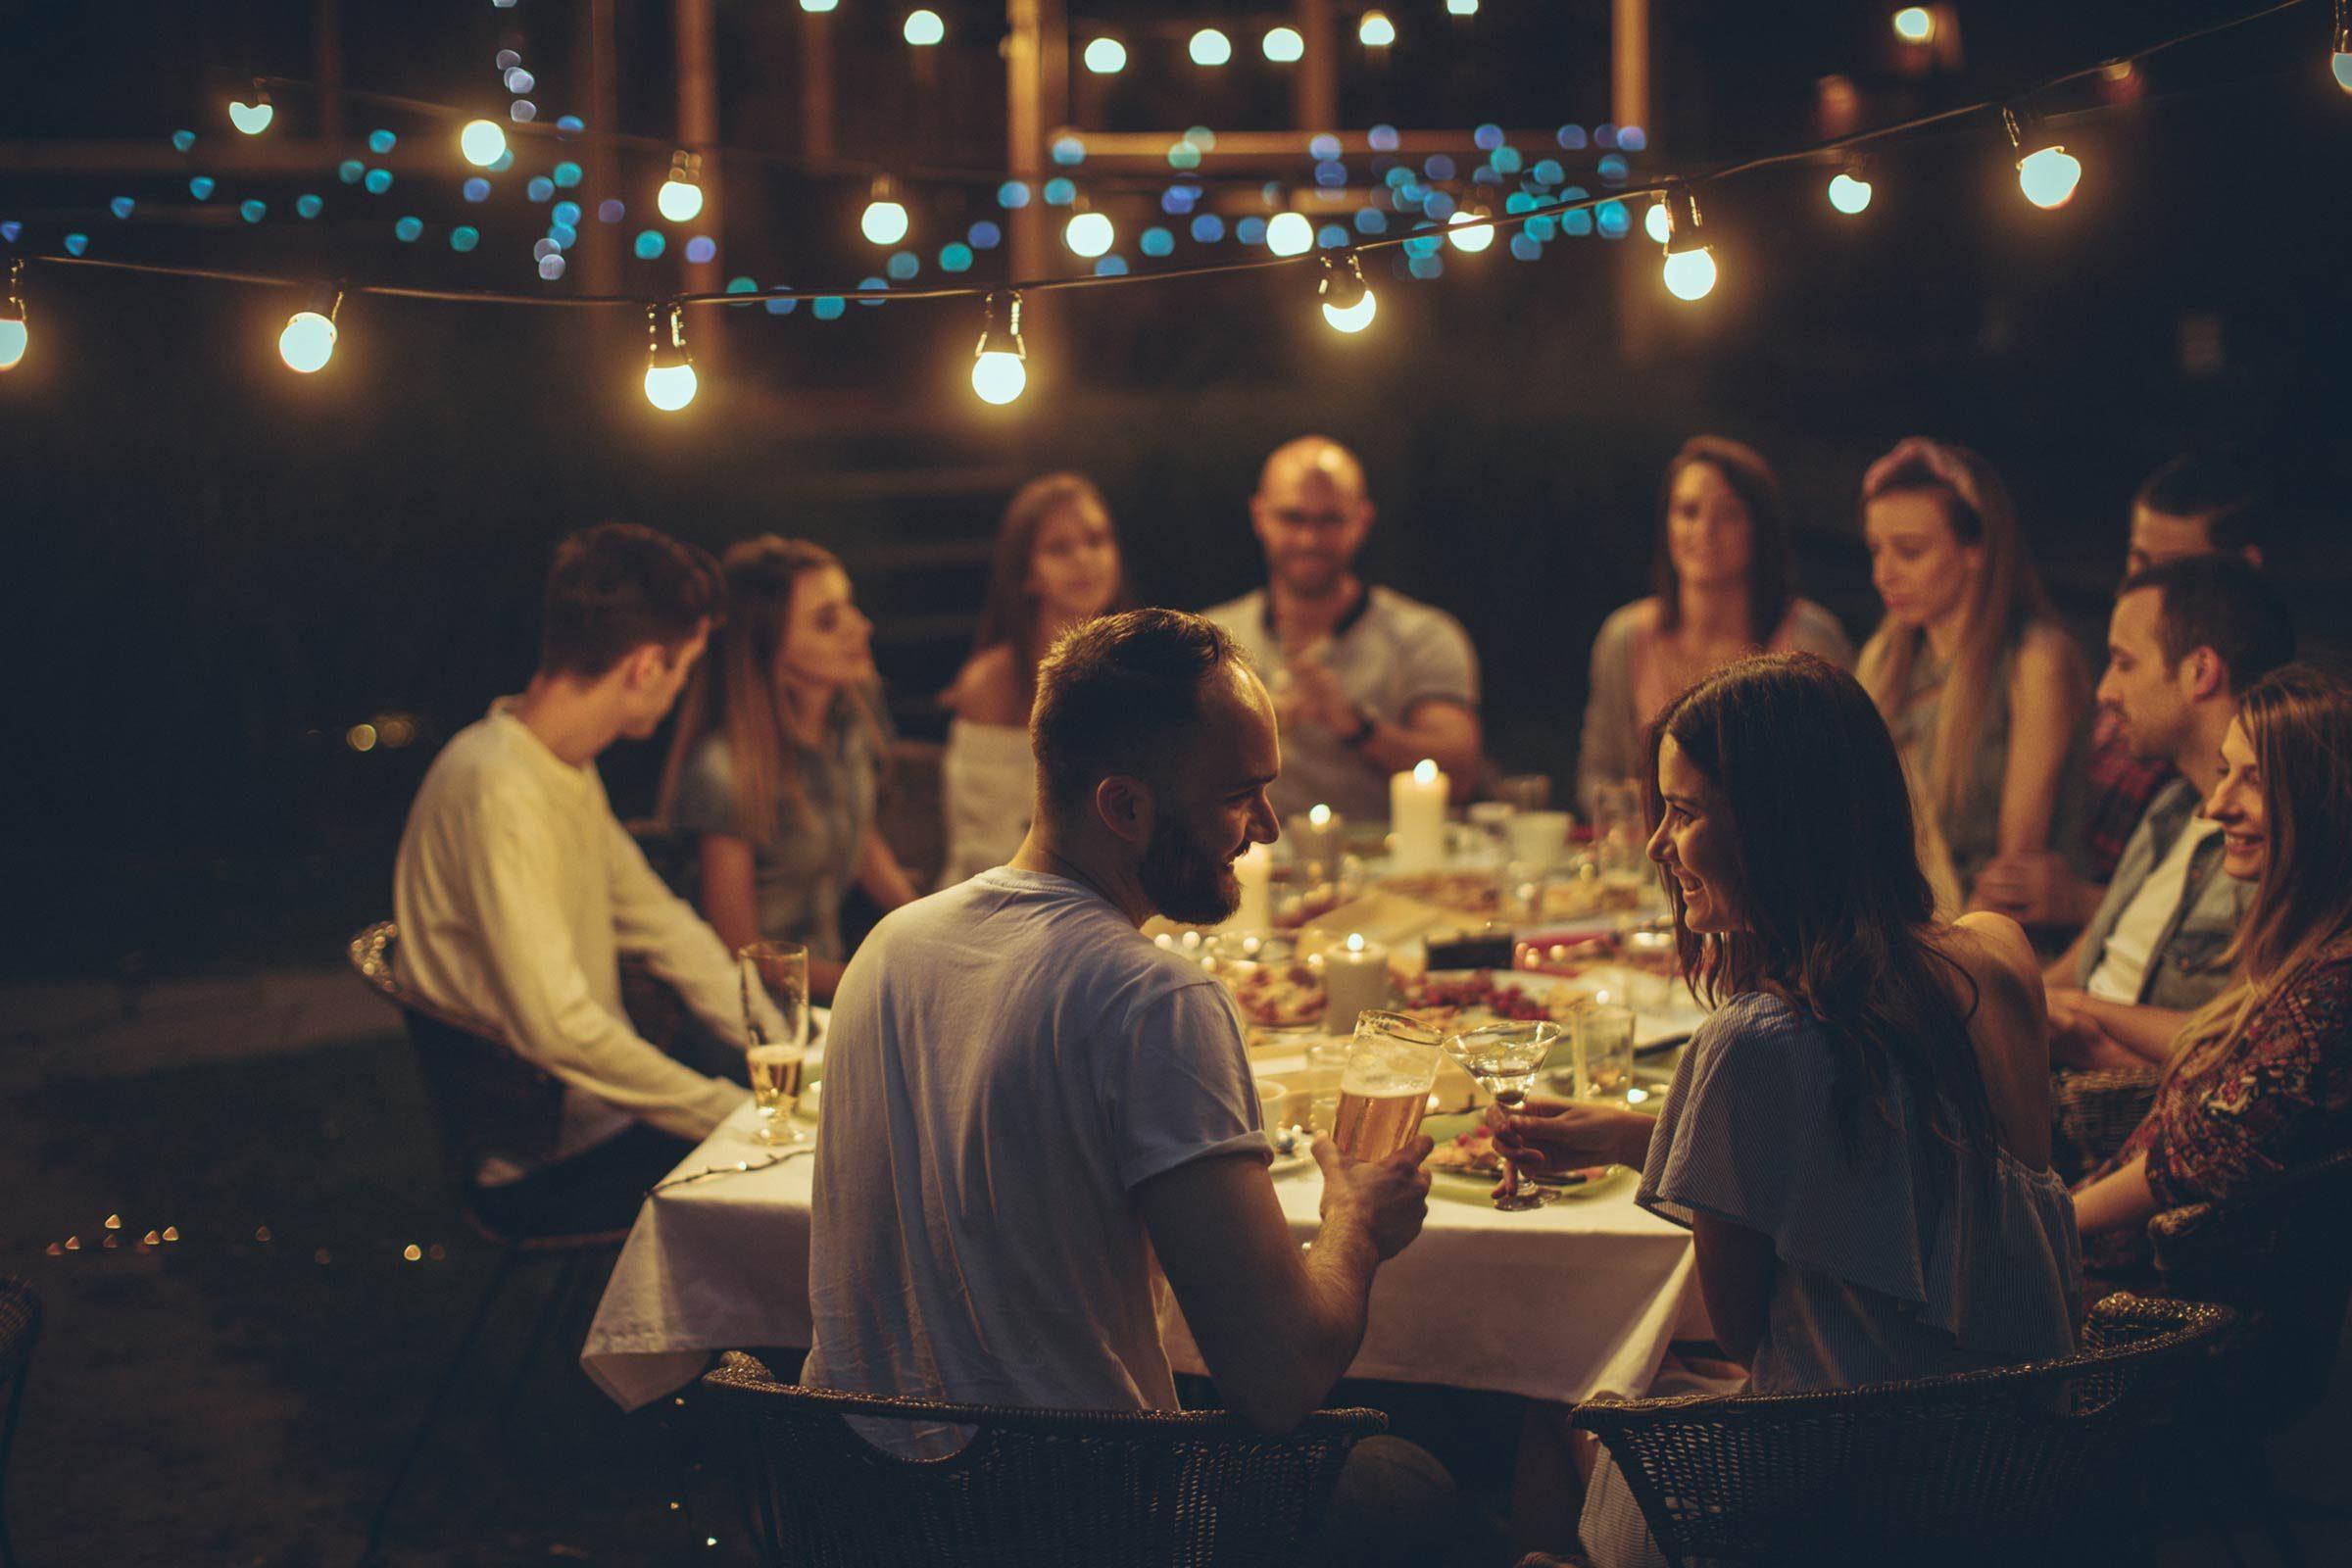 outside dinner party lights